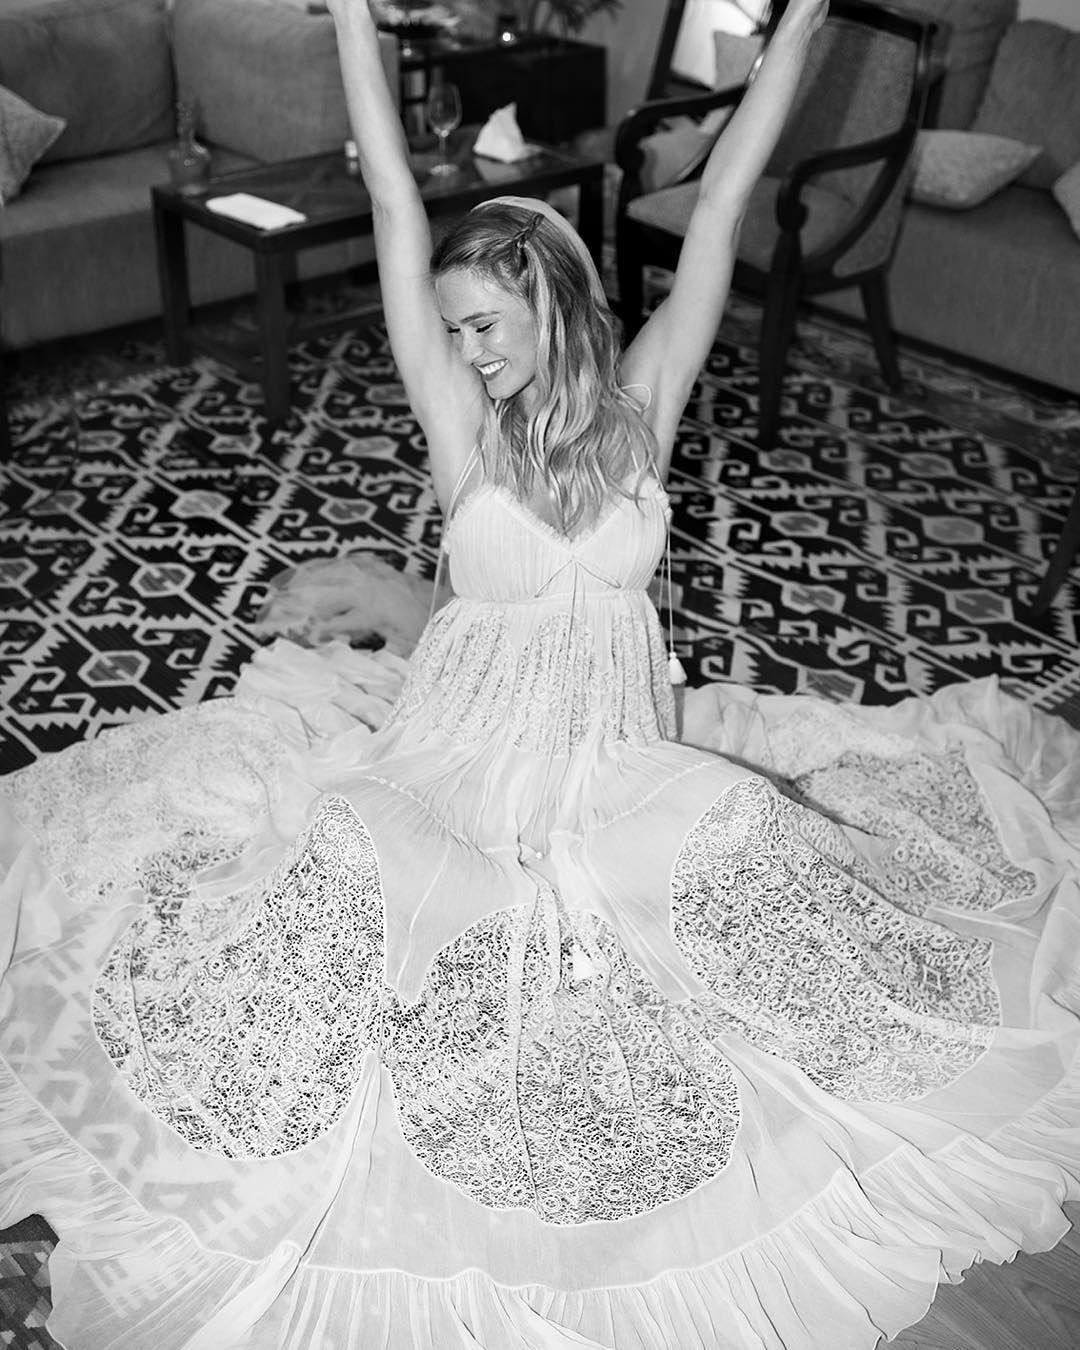 Bar refaeli marries in chlo chlo pinterest bar refaeli bar refaeli marries in chlo celebrity wedding dressescelebrity ombrellifo Image collections